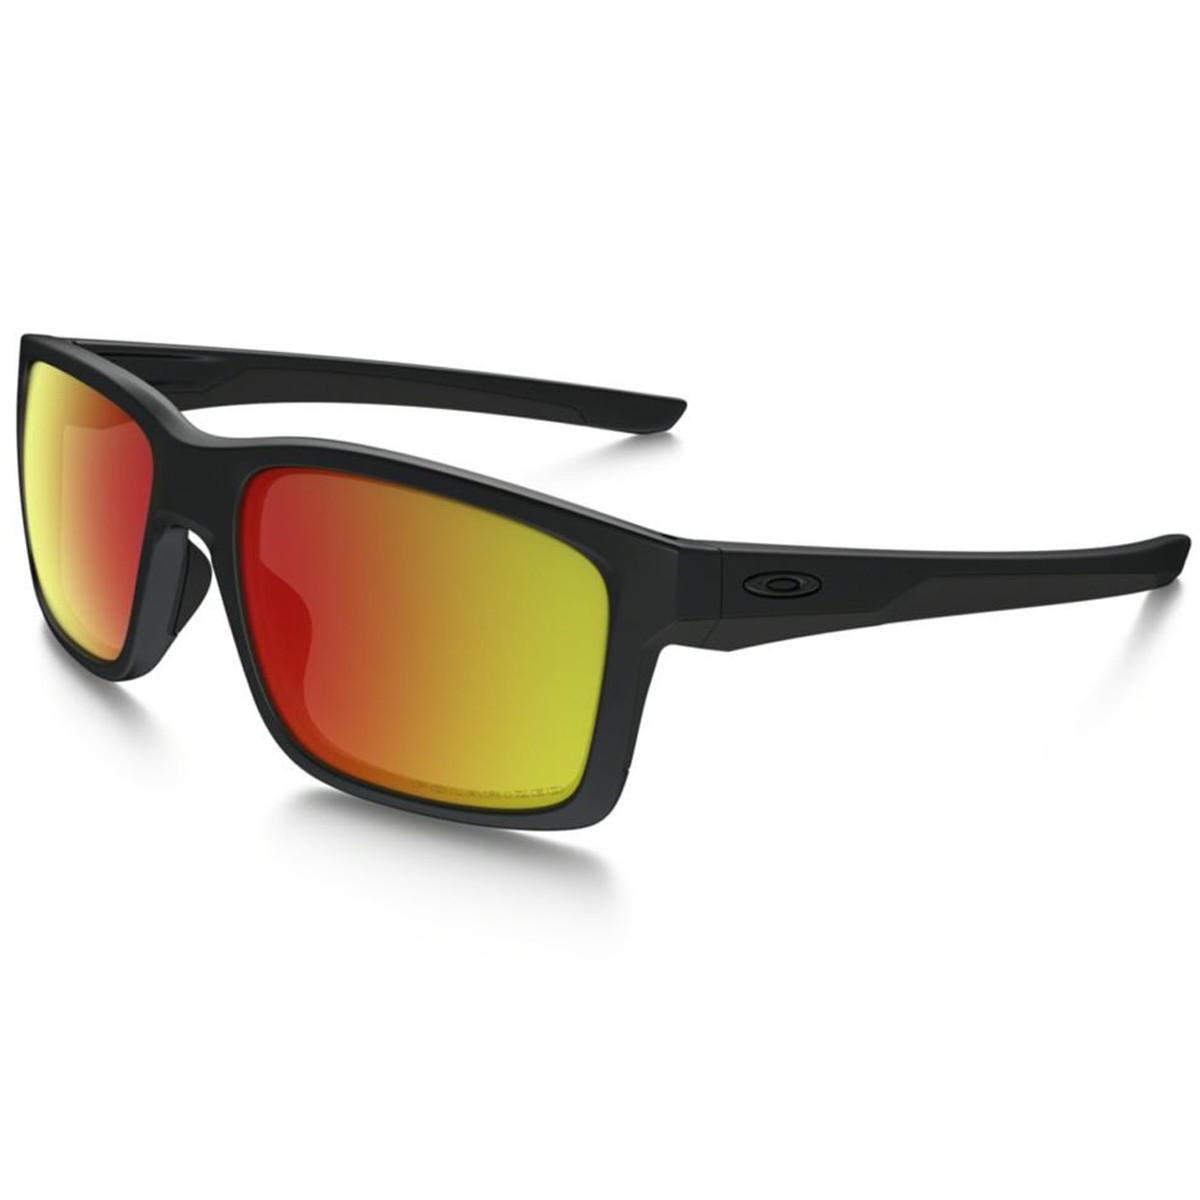 41bab43b87c83 Óculos Oakley Mainlink Matte Black  Lente Ruby Iridium Polarizado ...